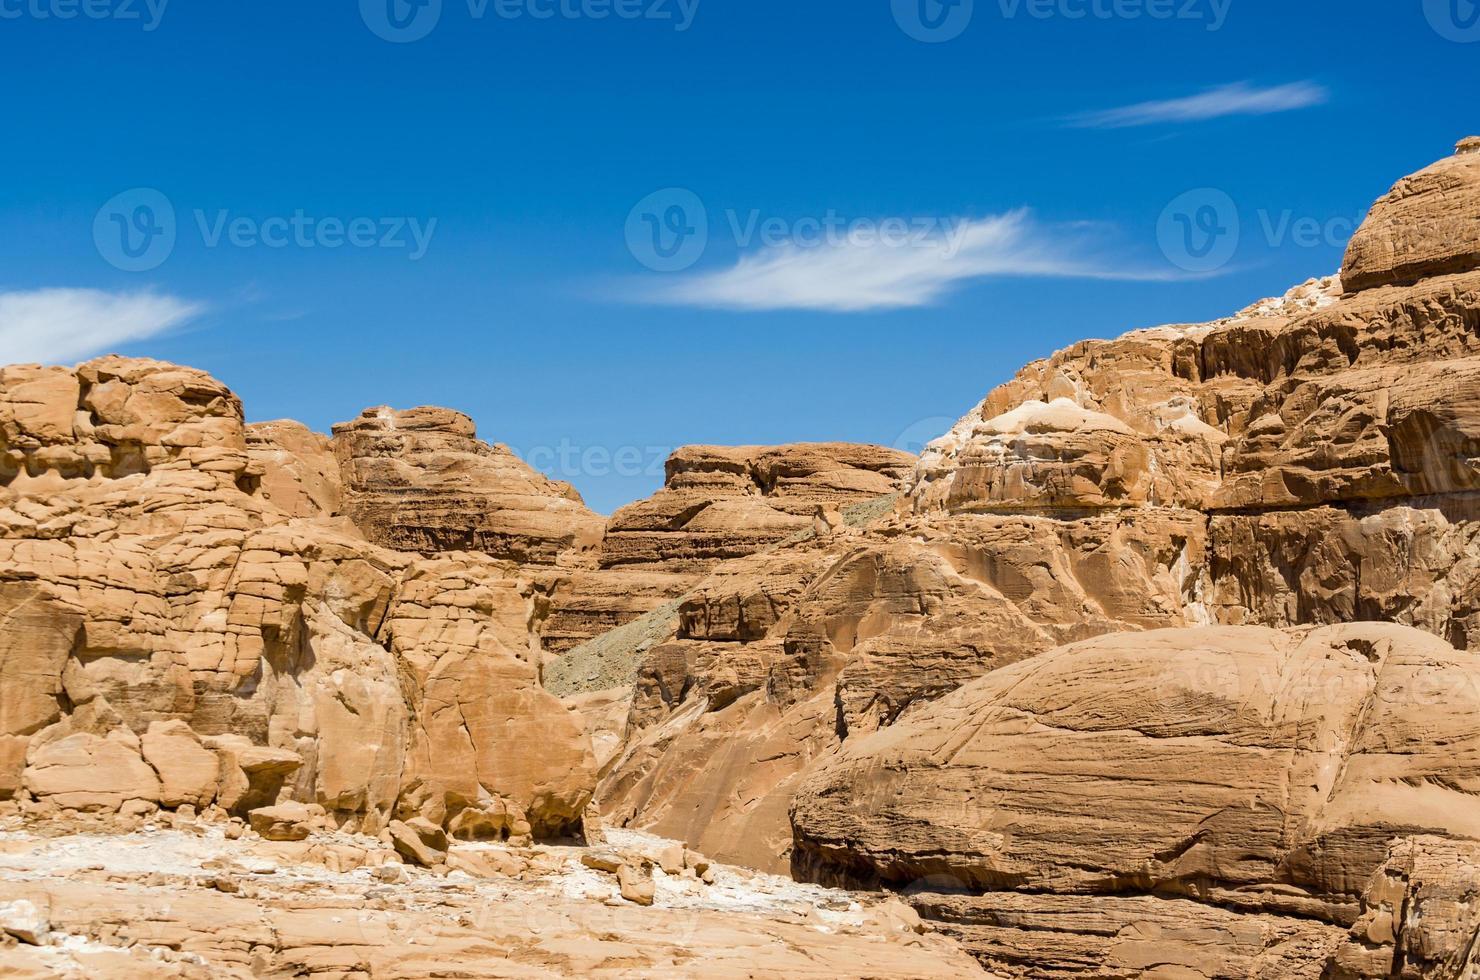 blauwe hemel over rotsachtige bergen foto